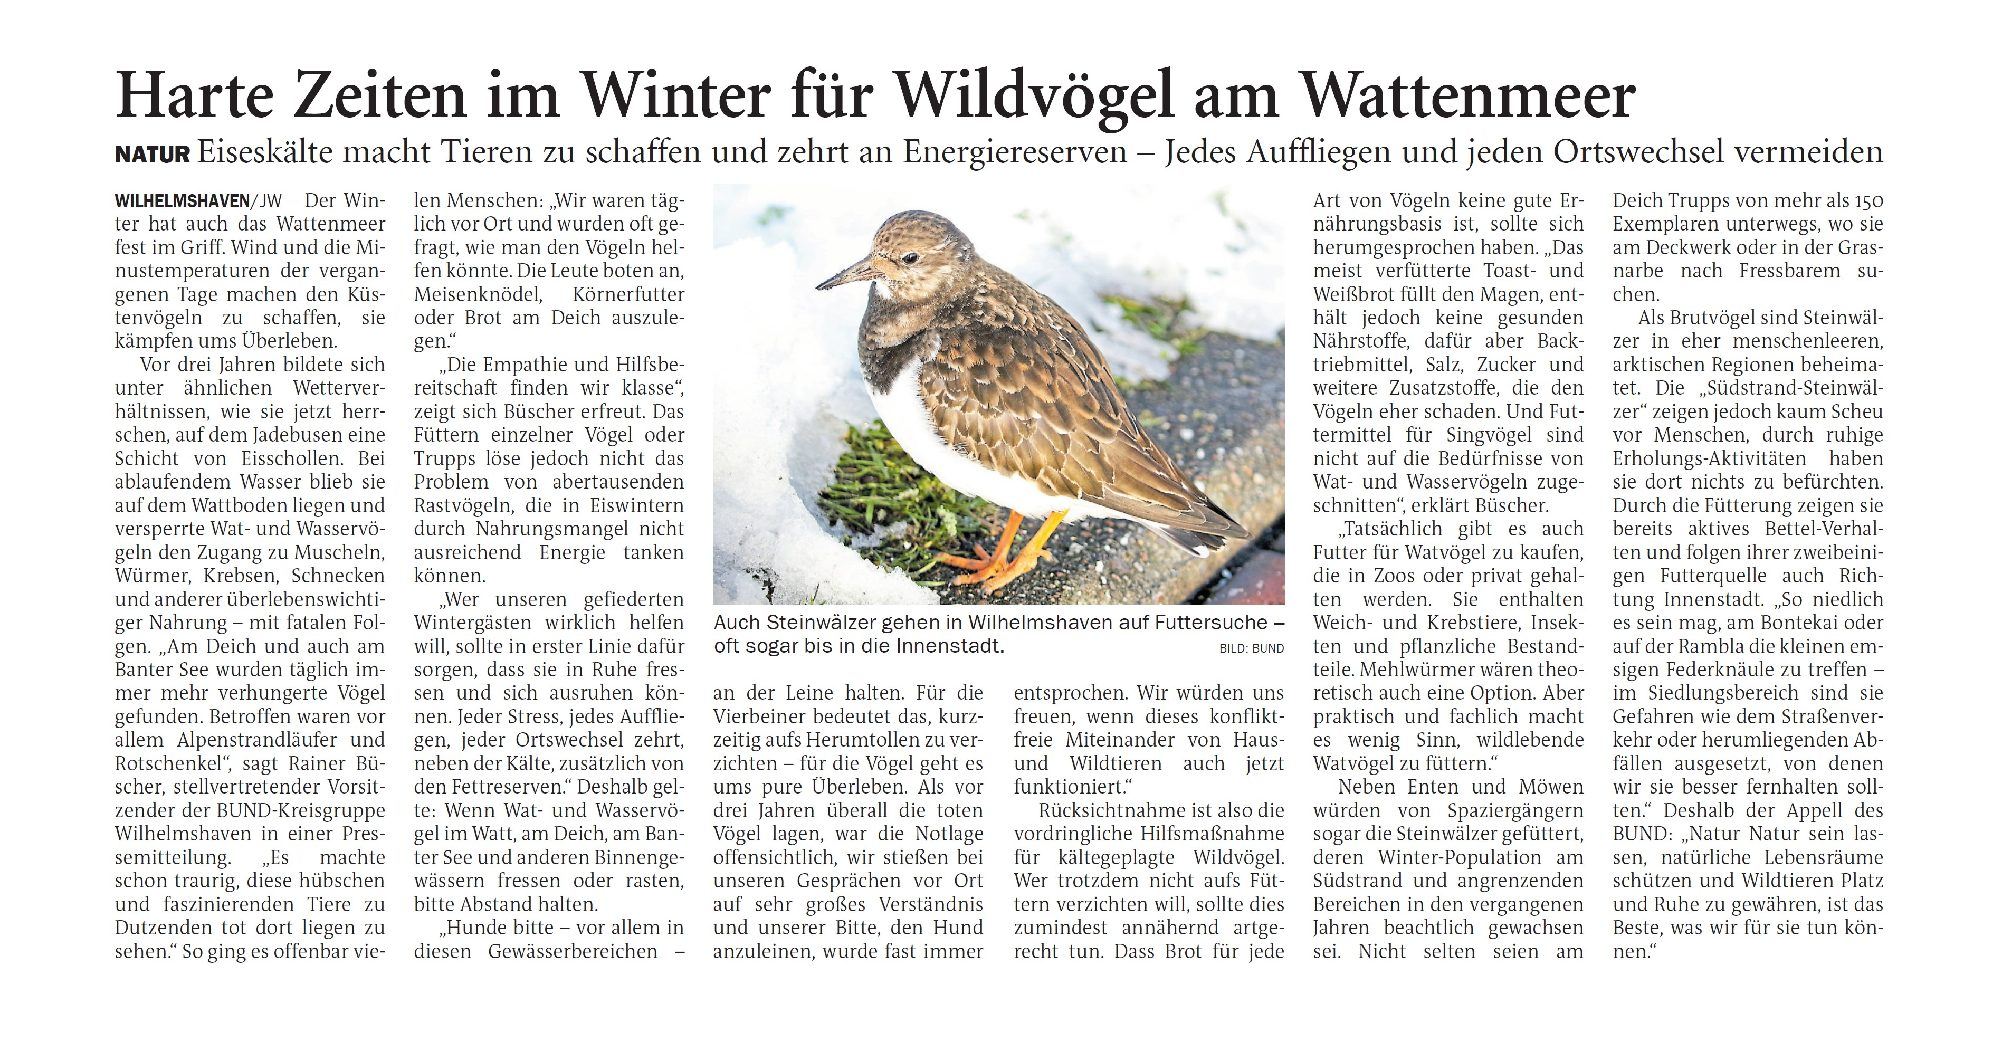 Jeversches Wochenblatt 16.02.2021 III